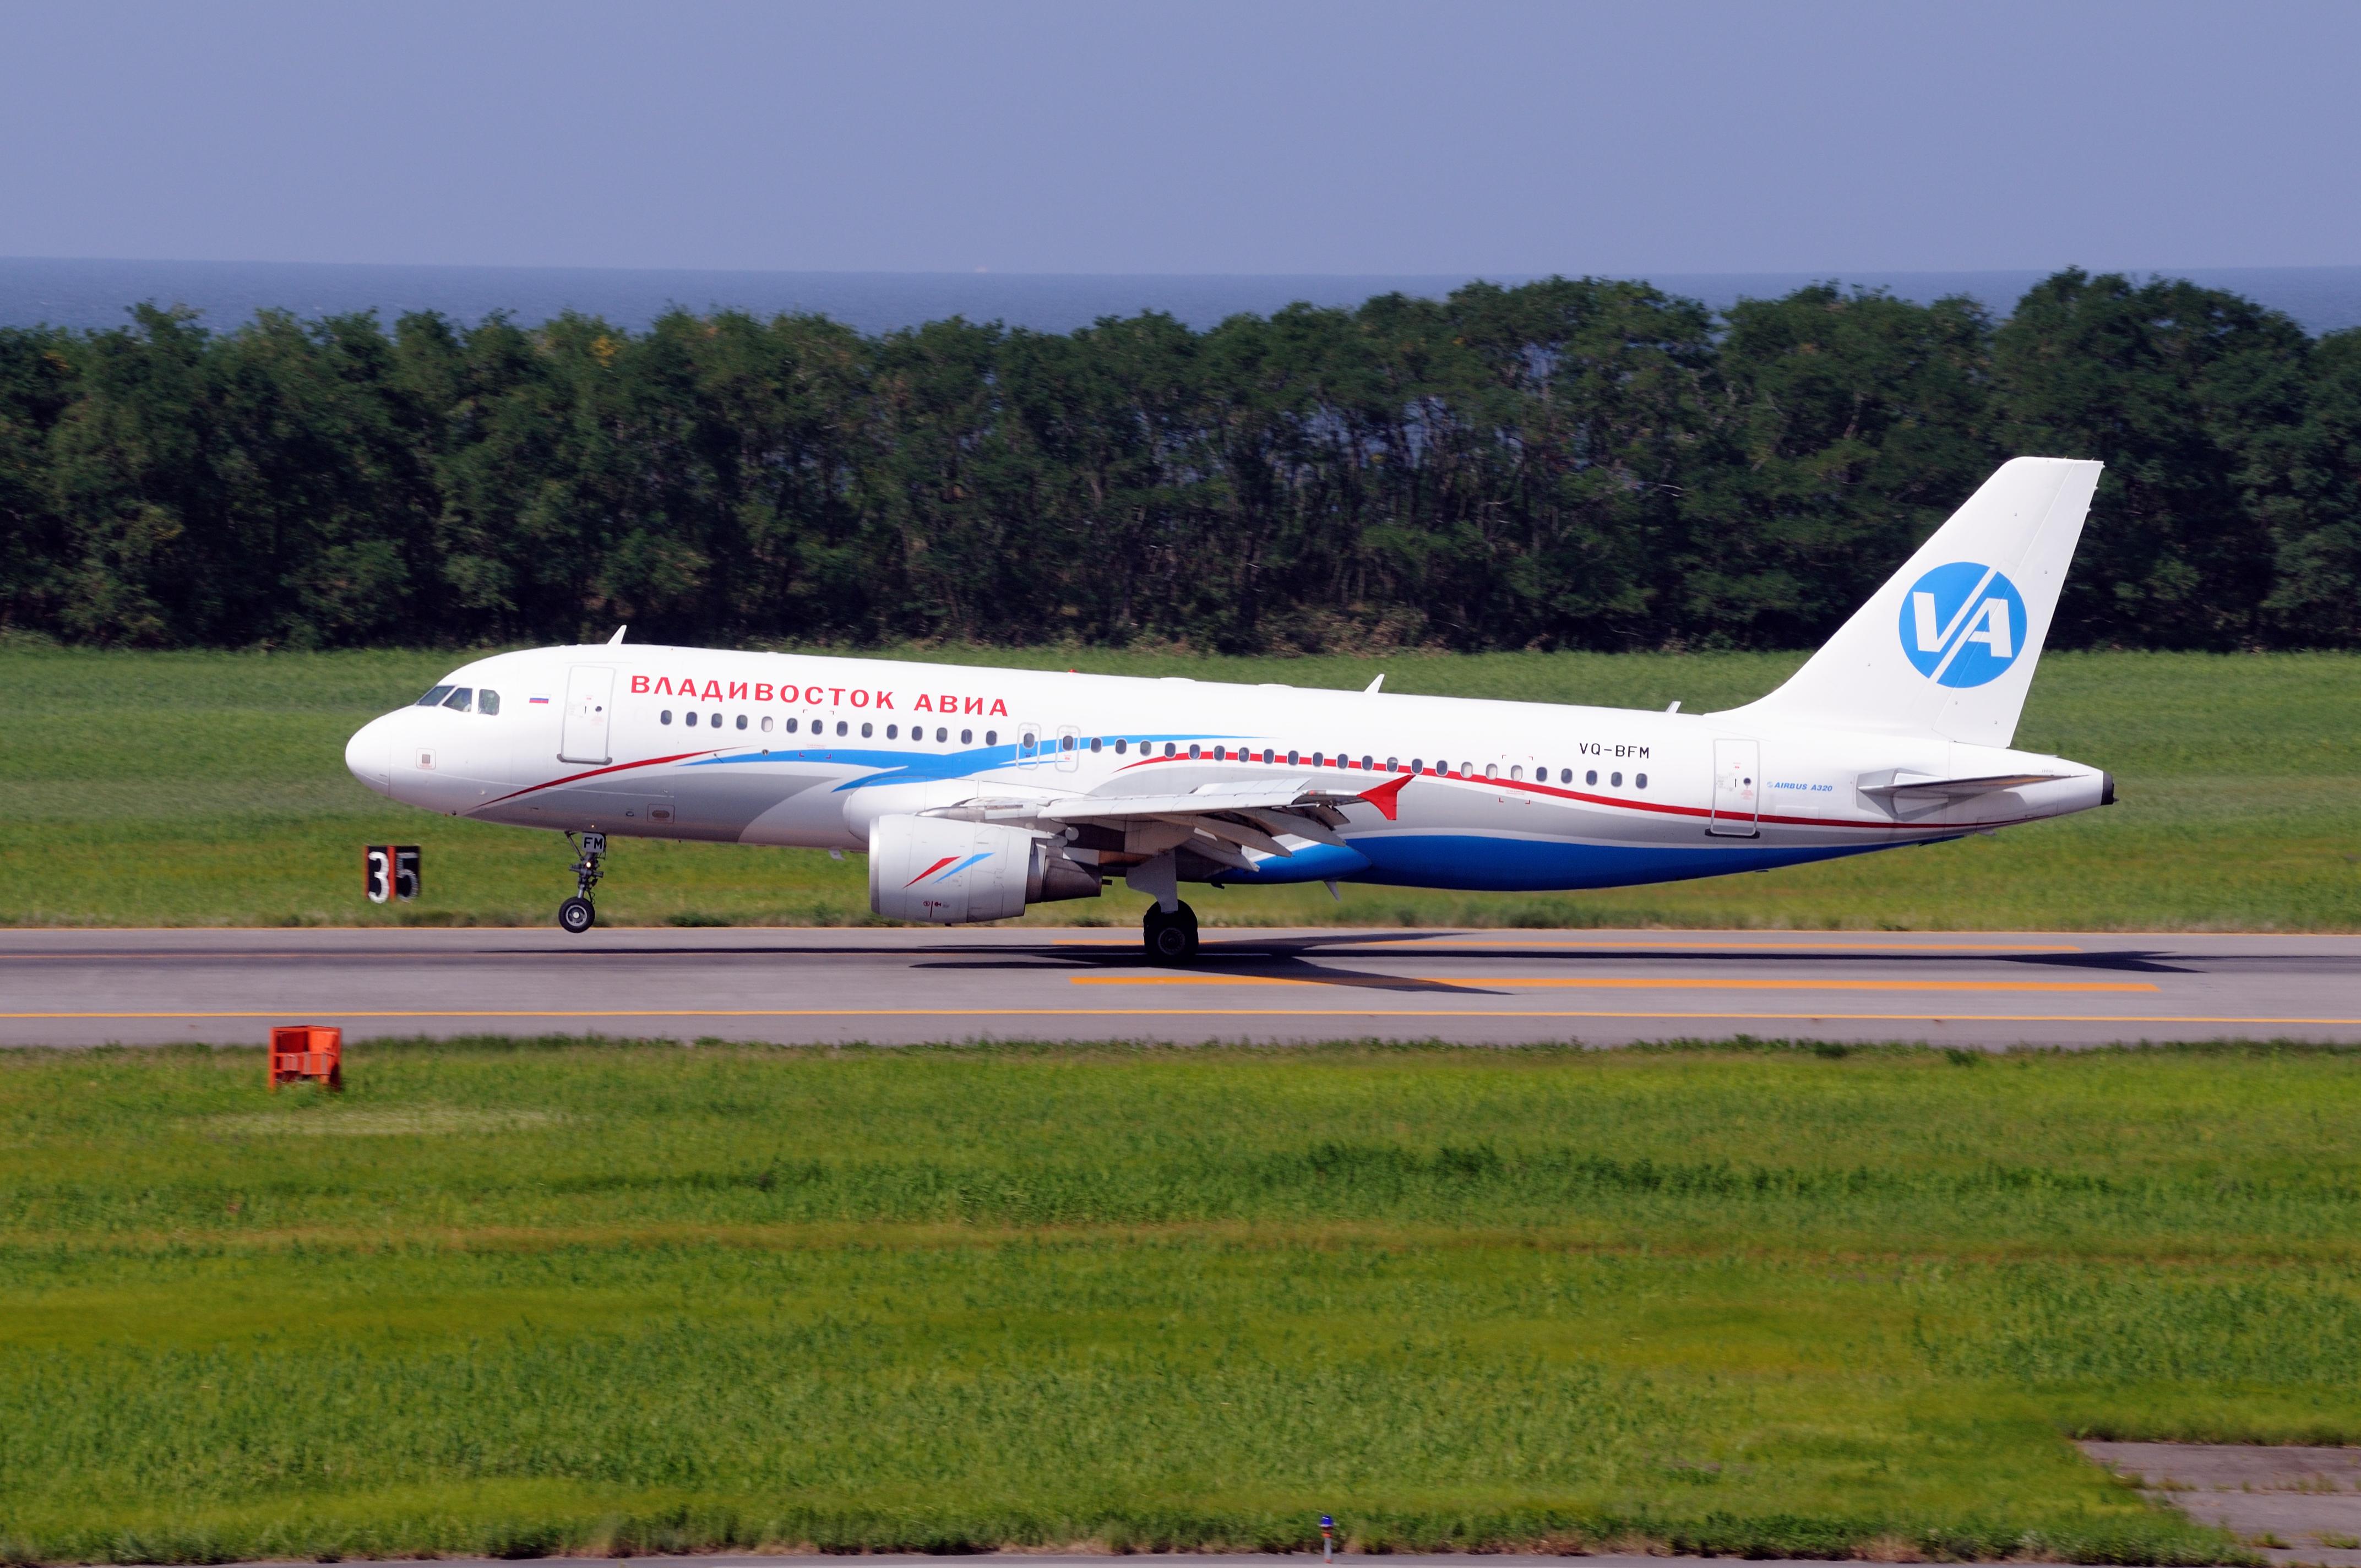 File:Vladivostok Air Airbus A320-214 (VQ-BFM 1379) (4934091593